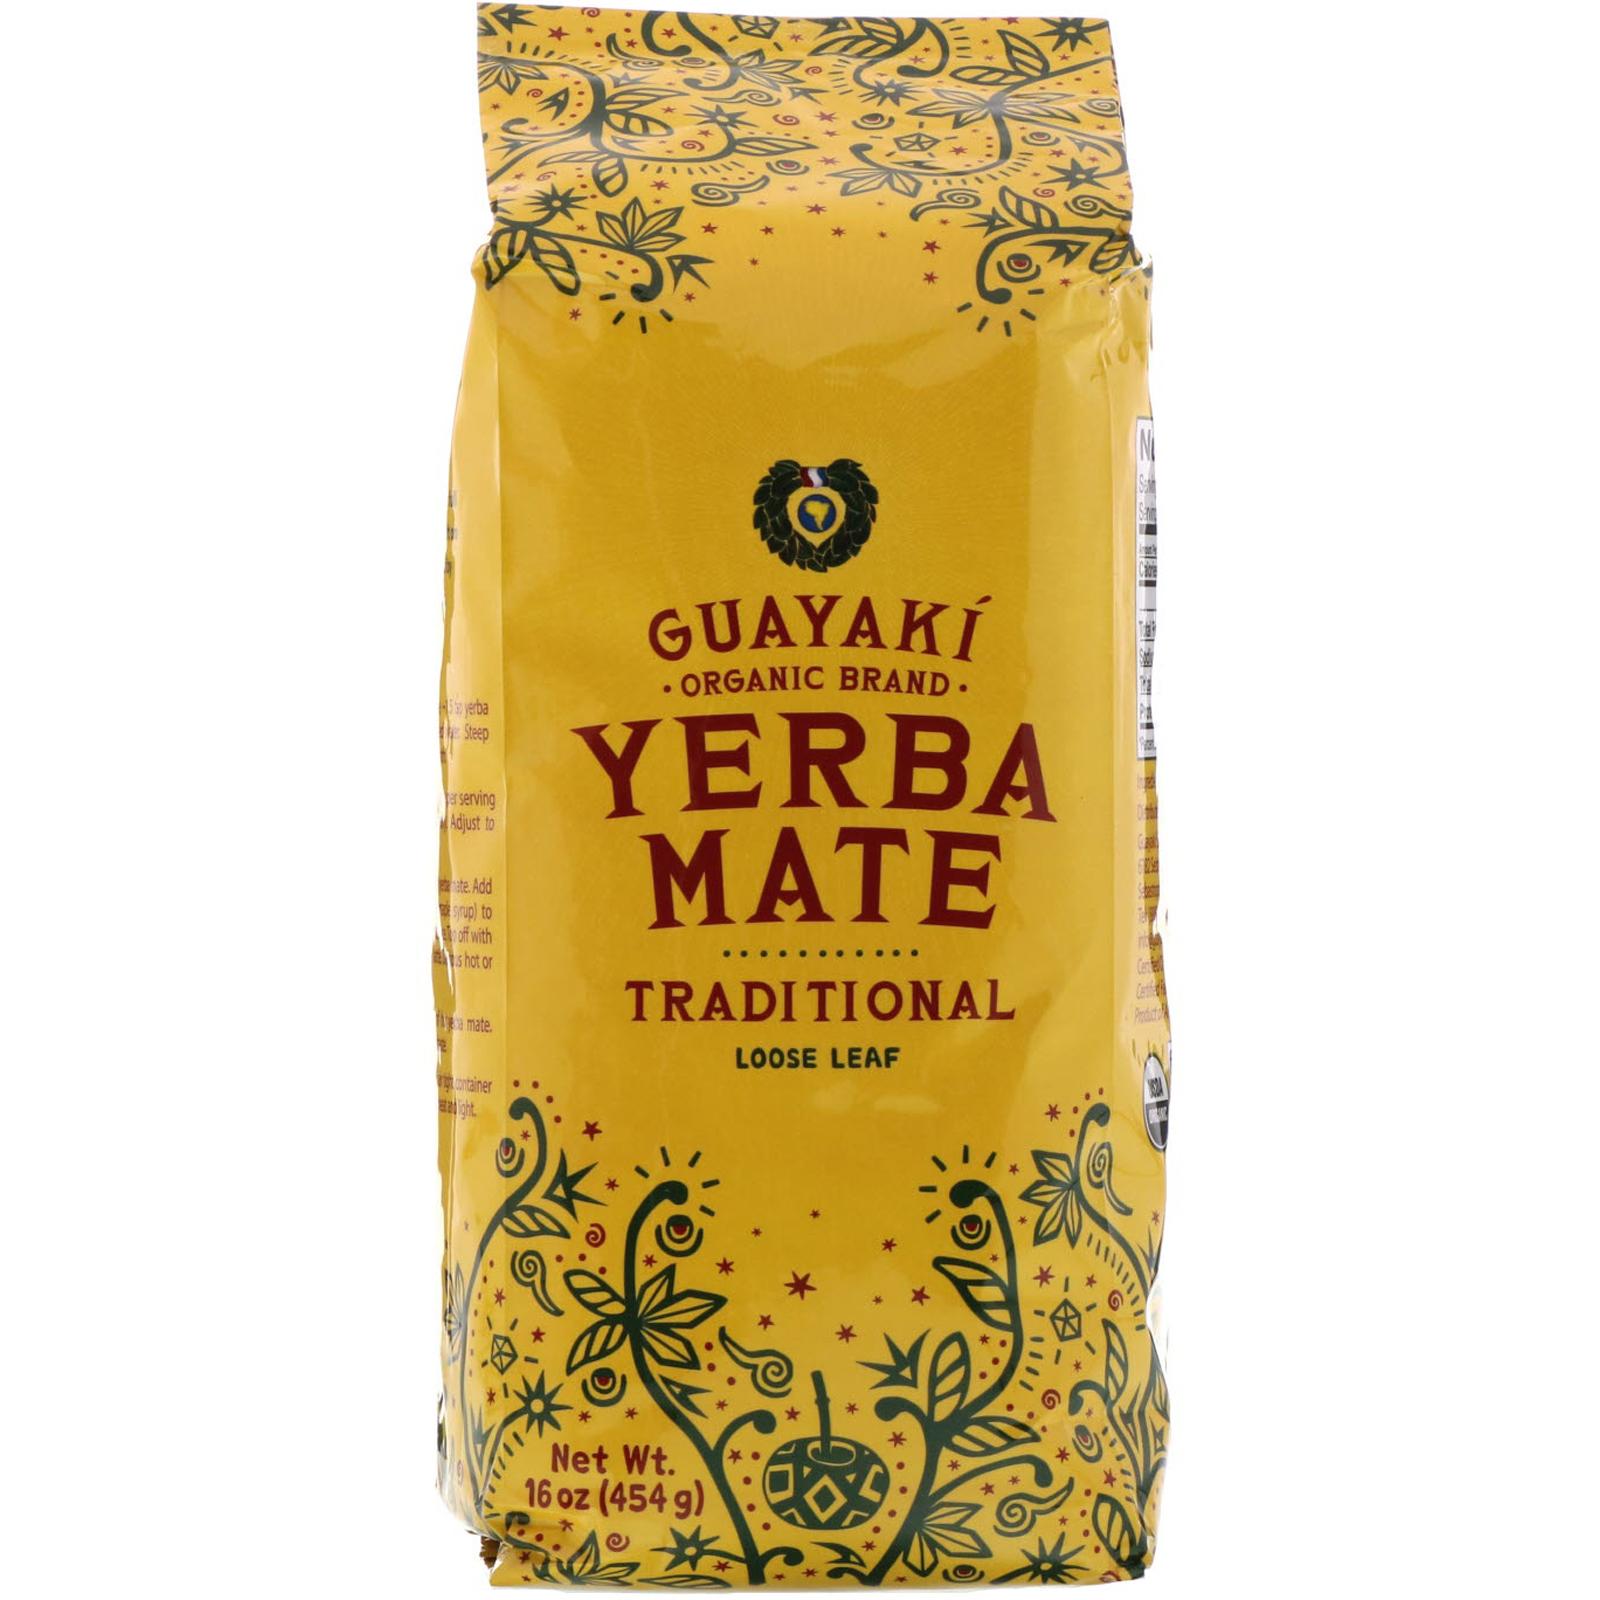 Guayaki, Yerba Mate, Loose Leaf Tea, Traditional, 16 oz (454 g)